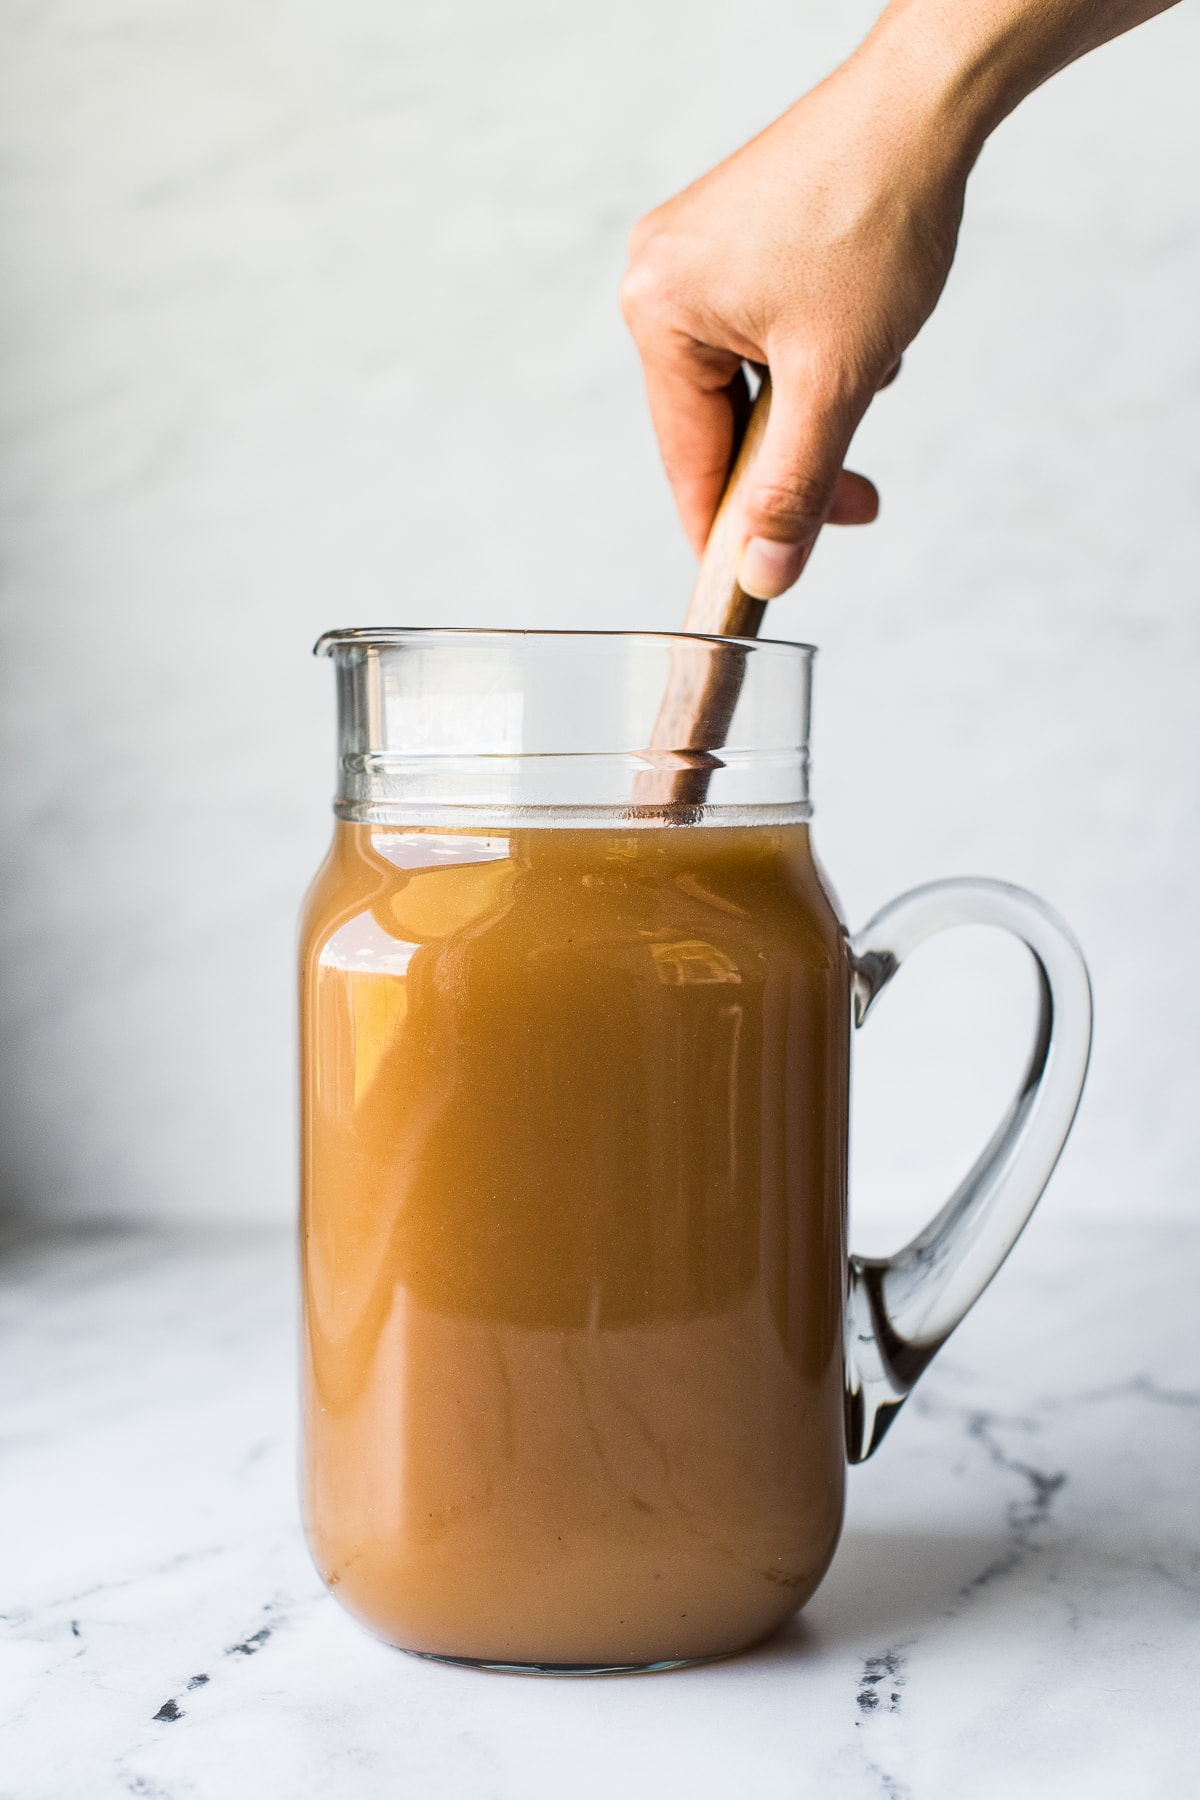 Mixing agua de tamarindo in a pitcher